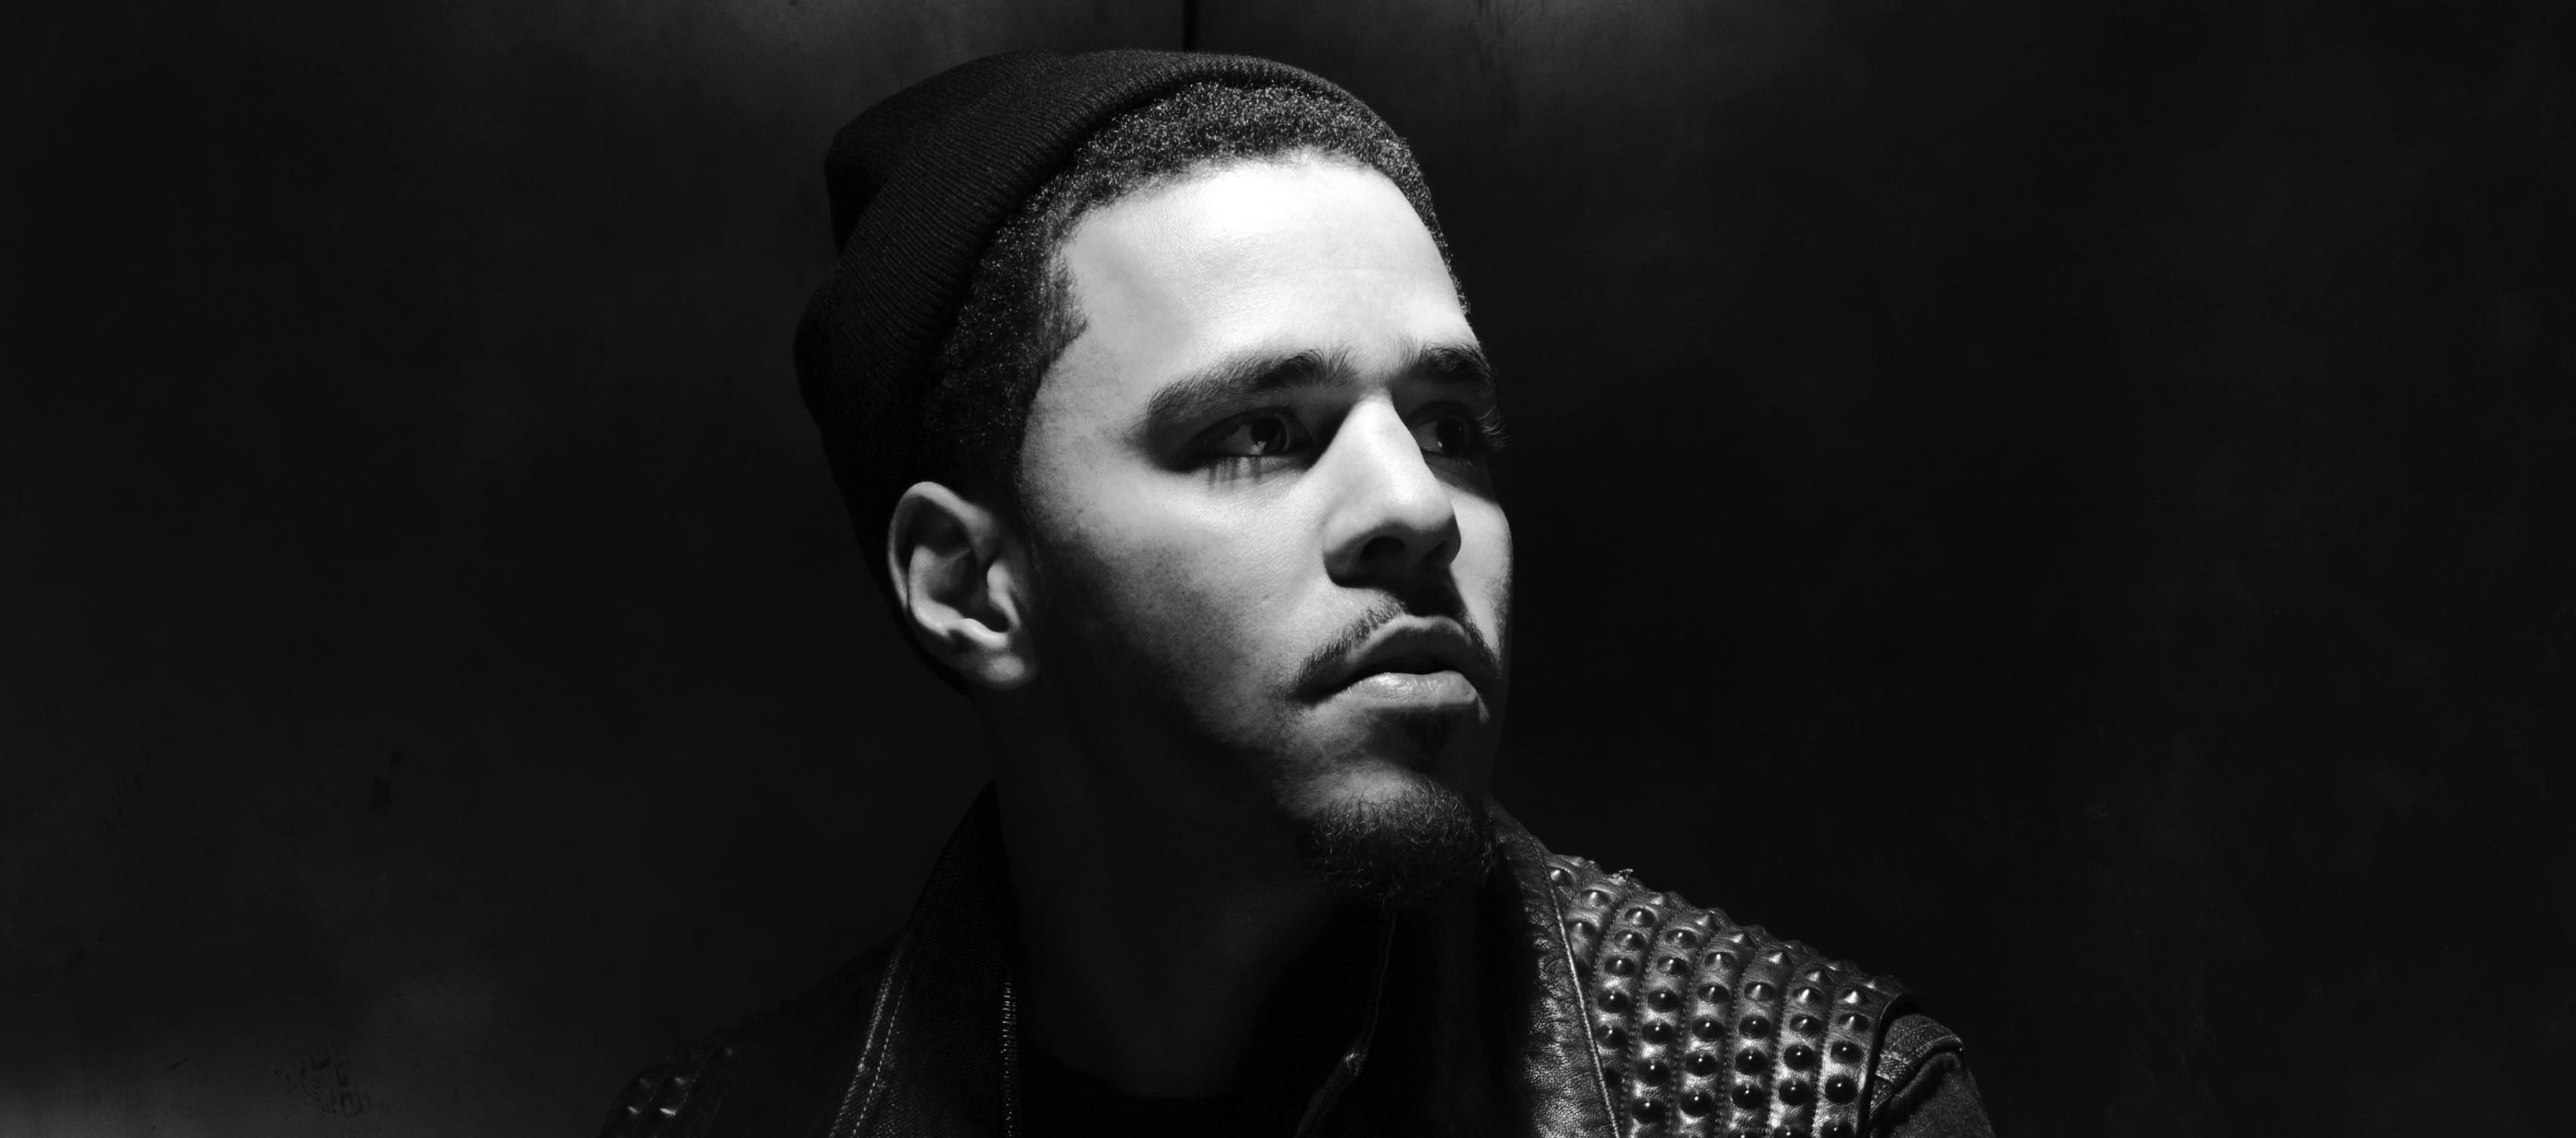 D'Allan Rixxx inspired by new artist Kendrick Lamar, Drake, Asap Rocky,  J.Cole ?